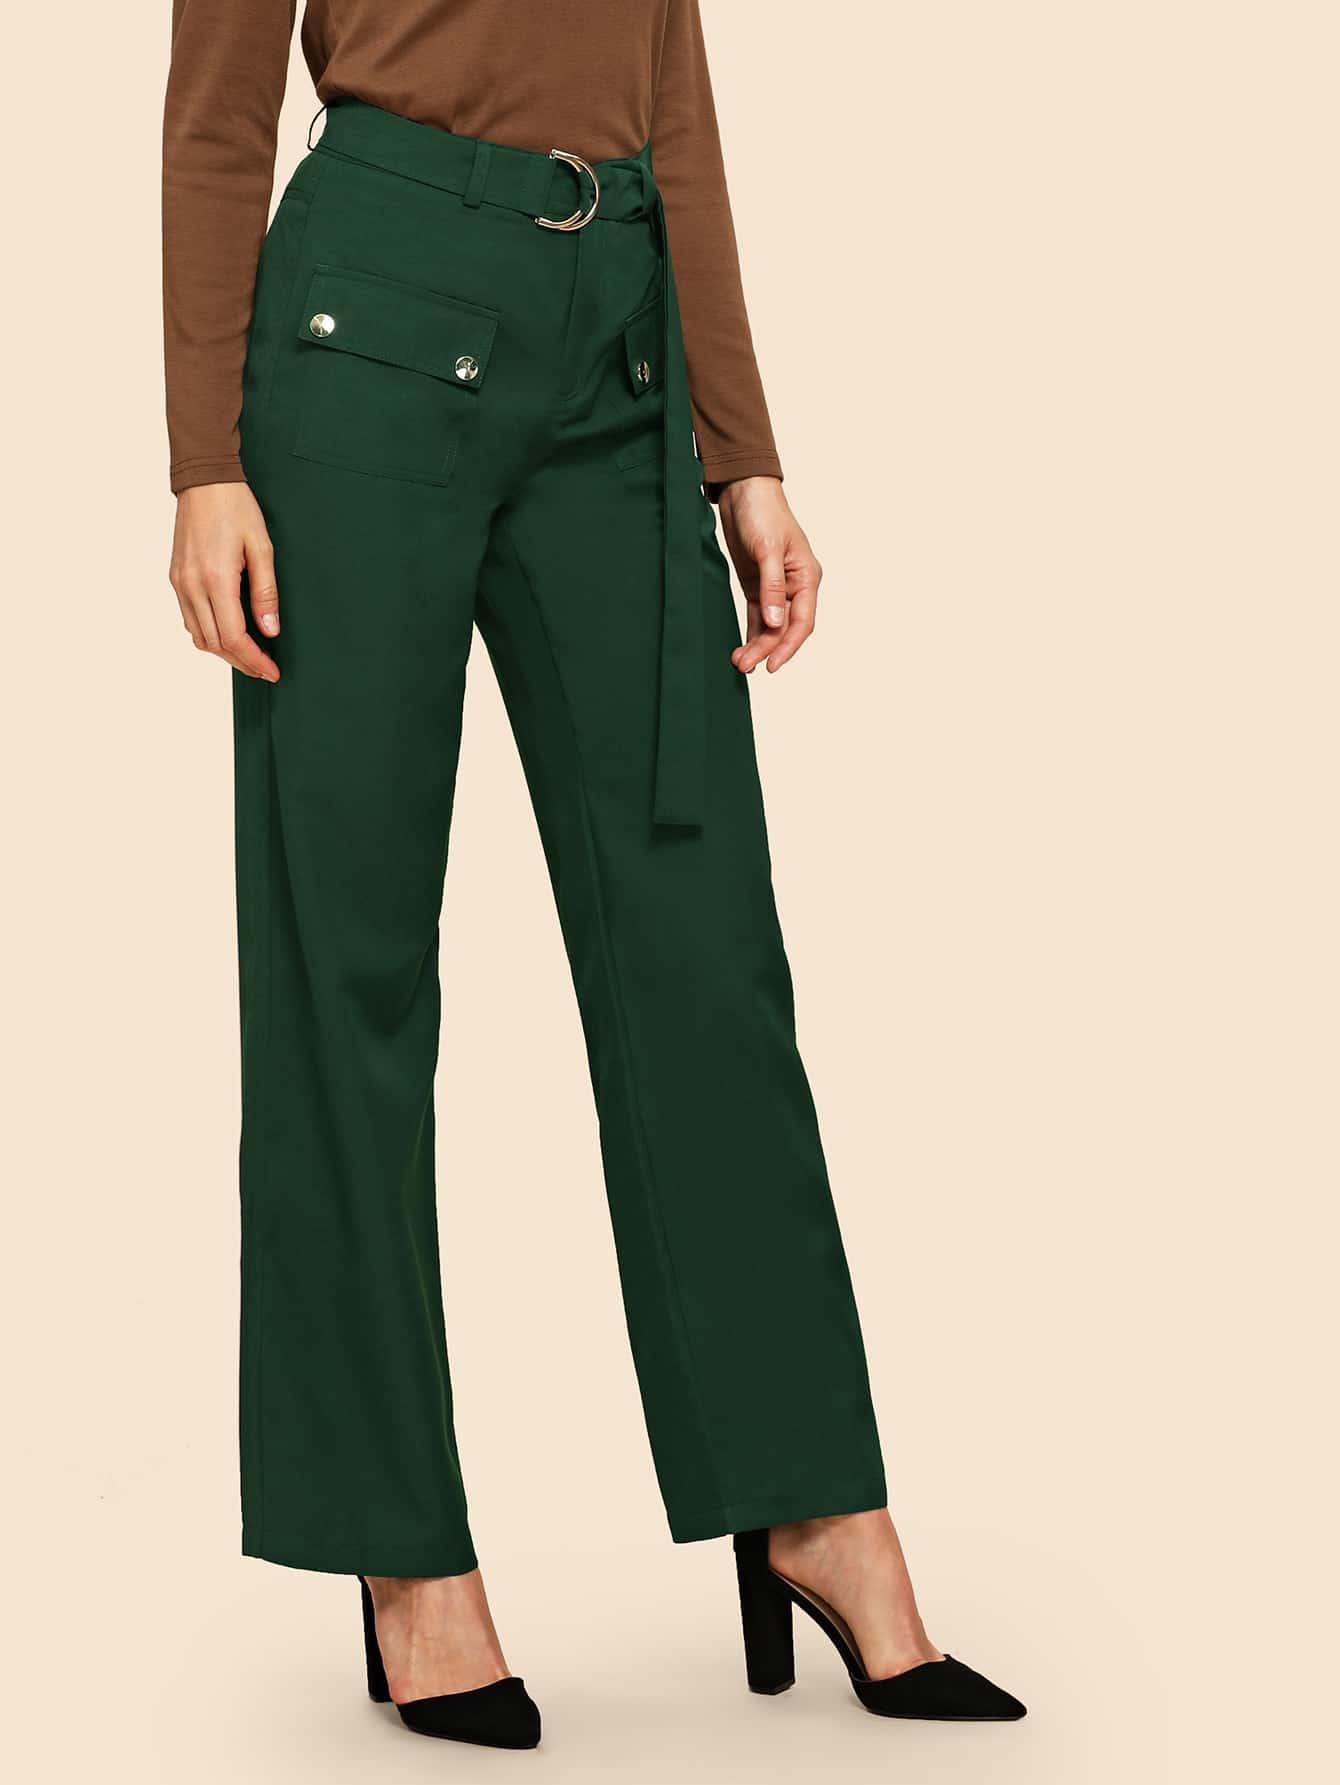 70s Однотонные брюки с карманами thumbnail